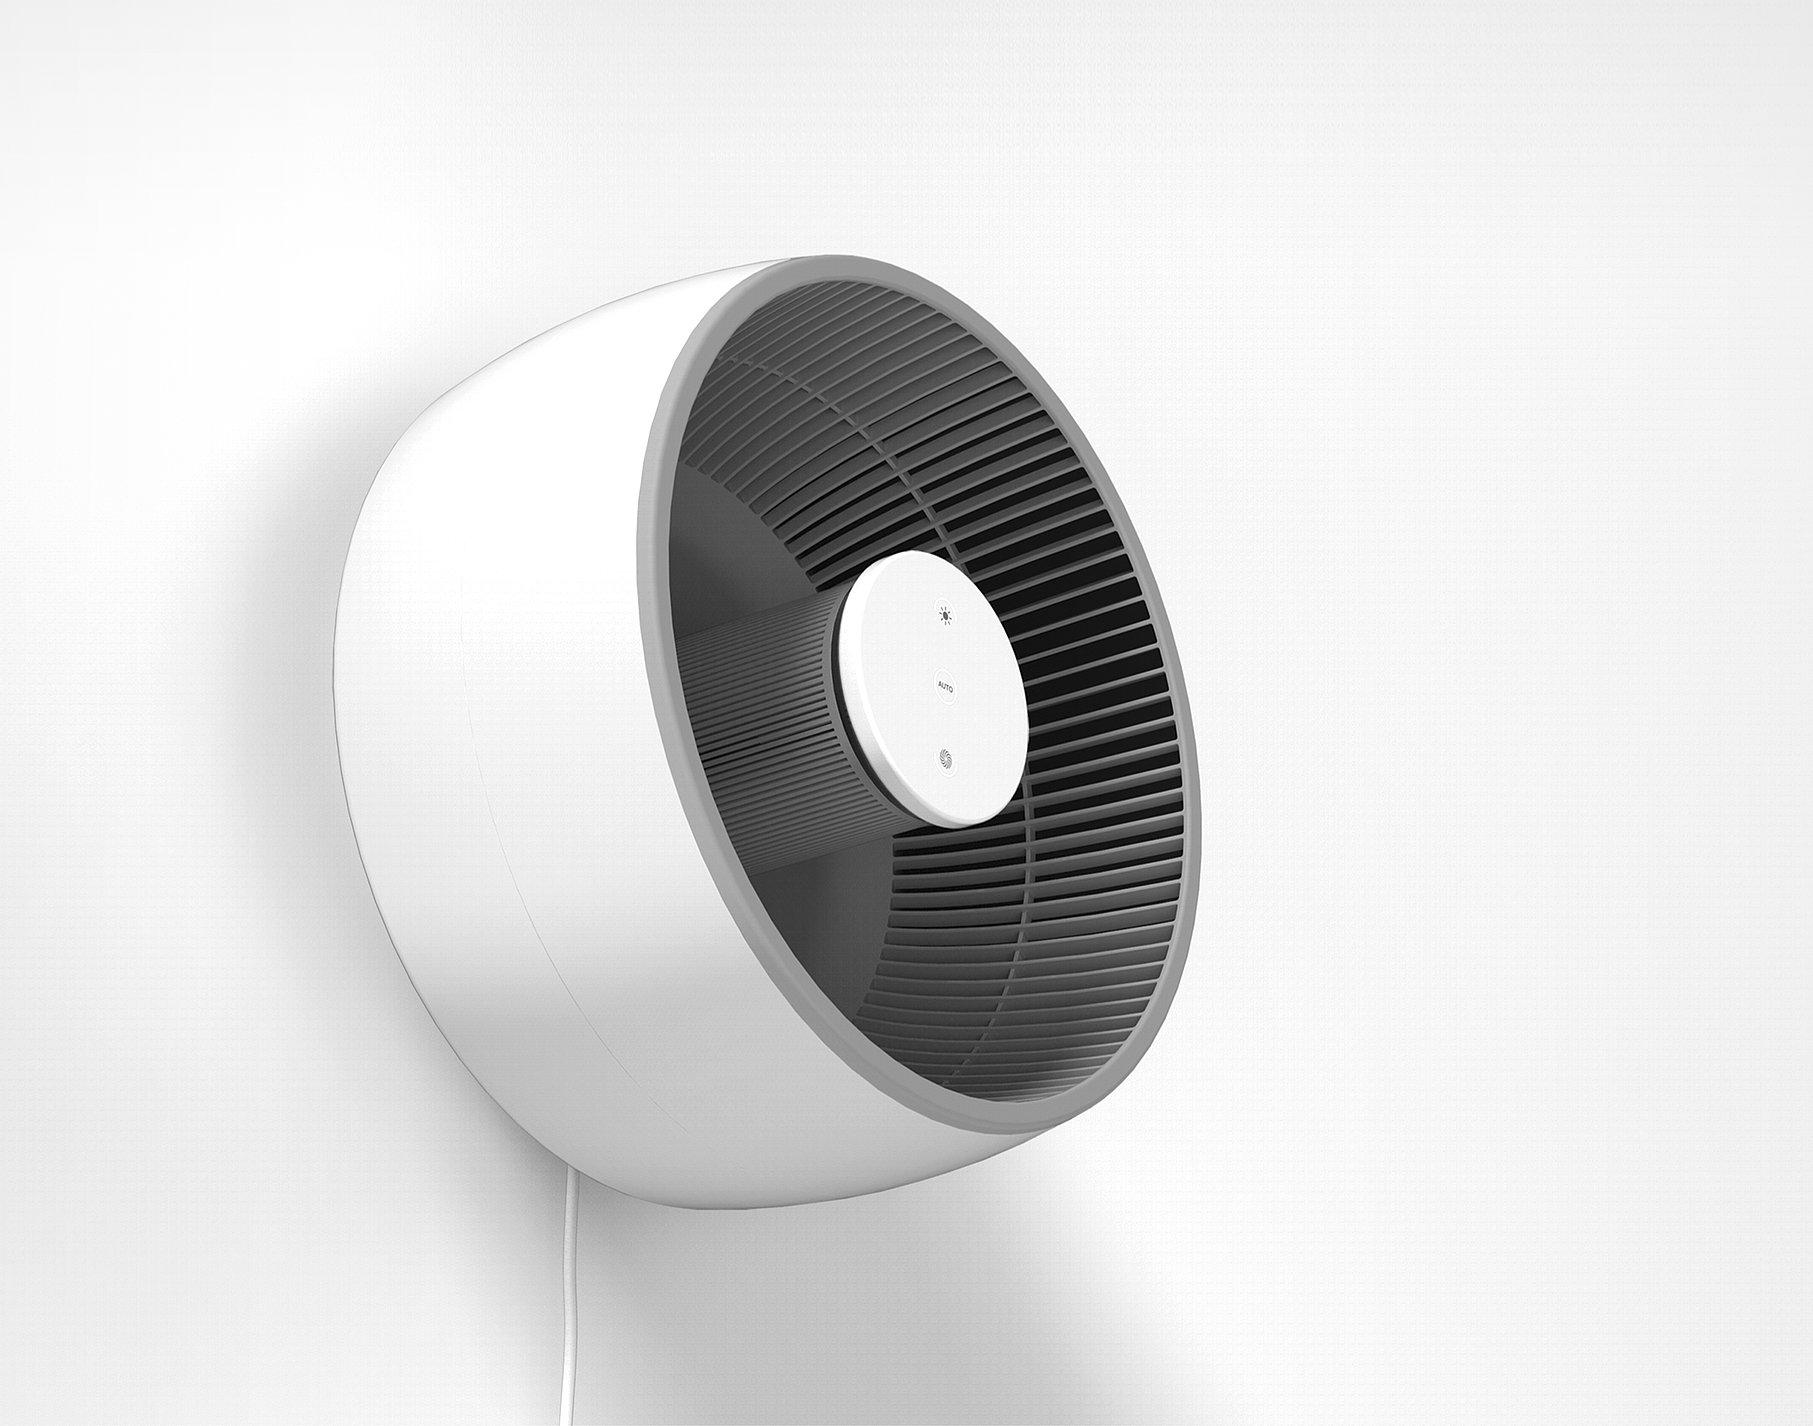 Suction Dryer | Red Dot Design Award